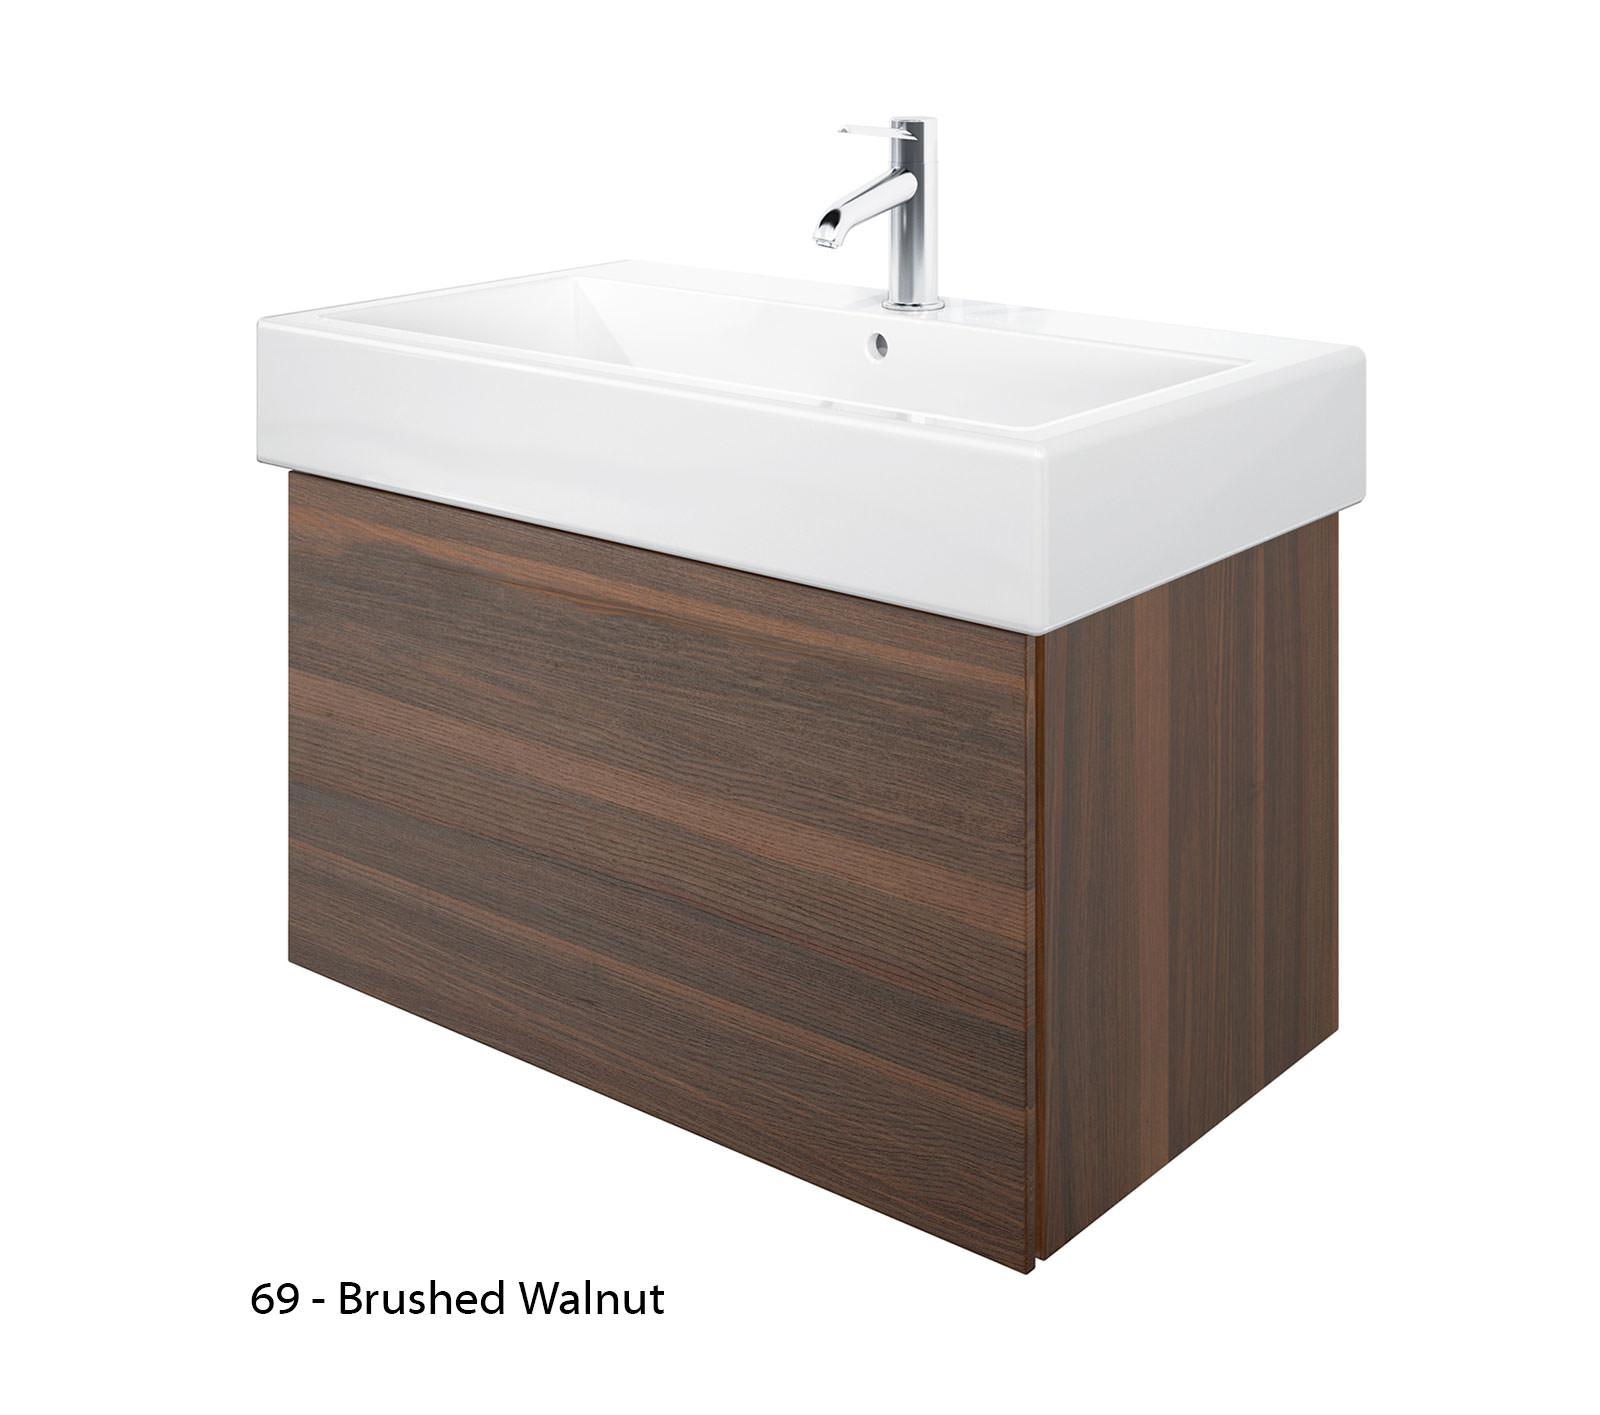 Duravit delos 1 compartment brushed oak unit with 800mm basin - Duravit bathroom furniture uk ...